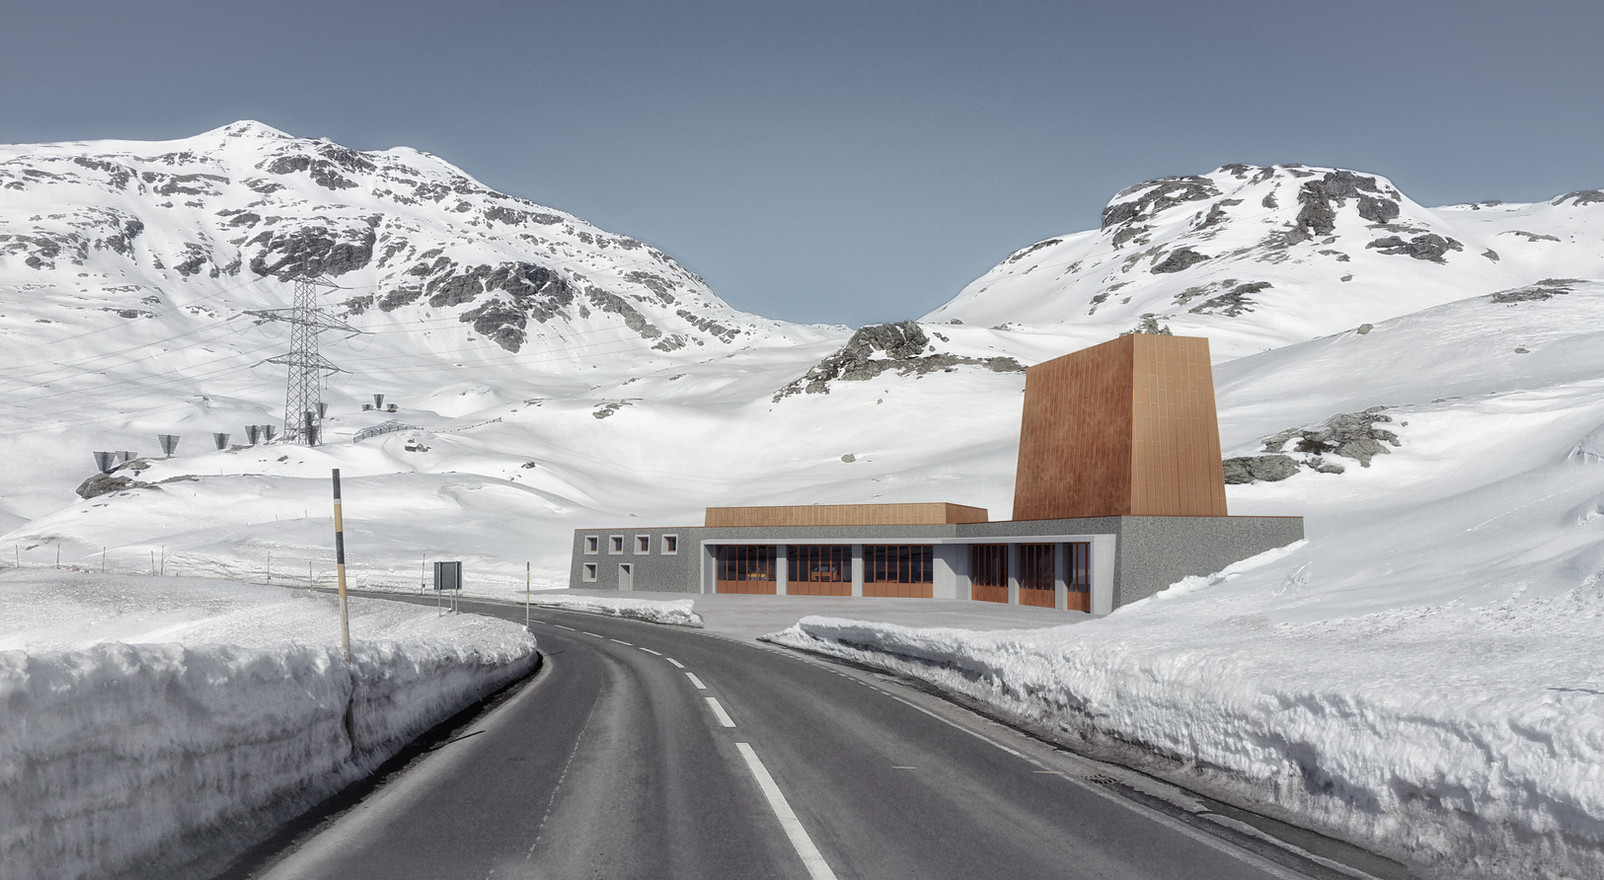 Neubau Unterstützungspunkt Bernina, 2016